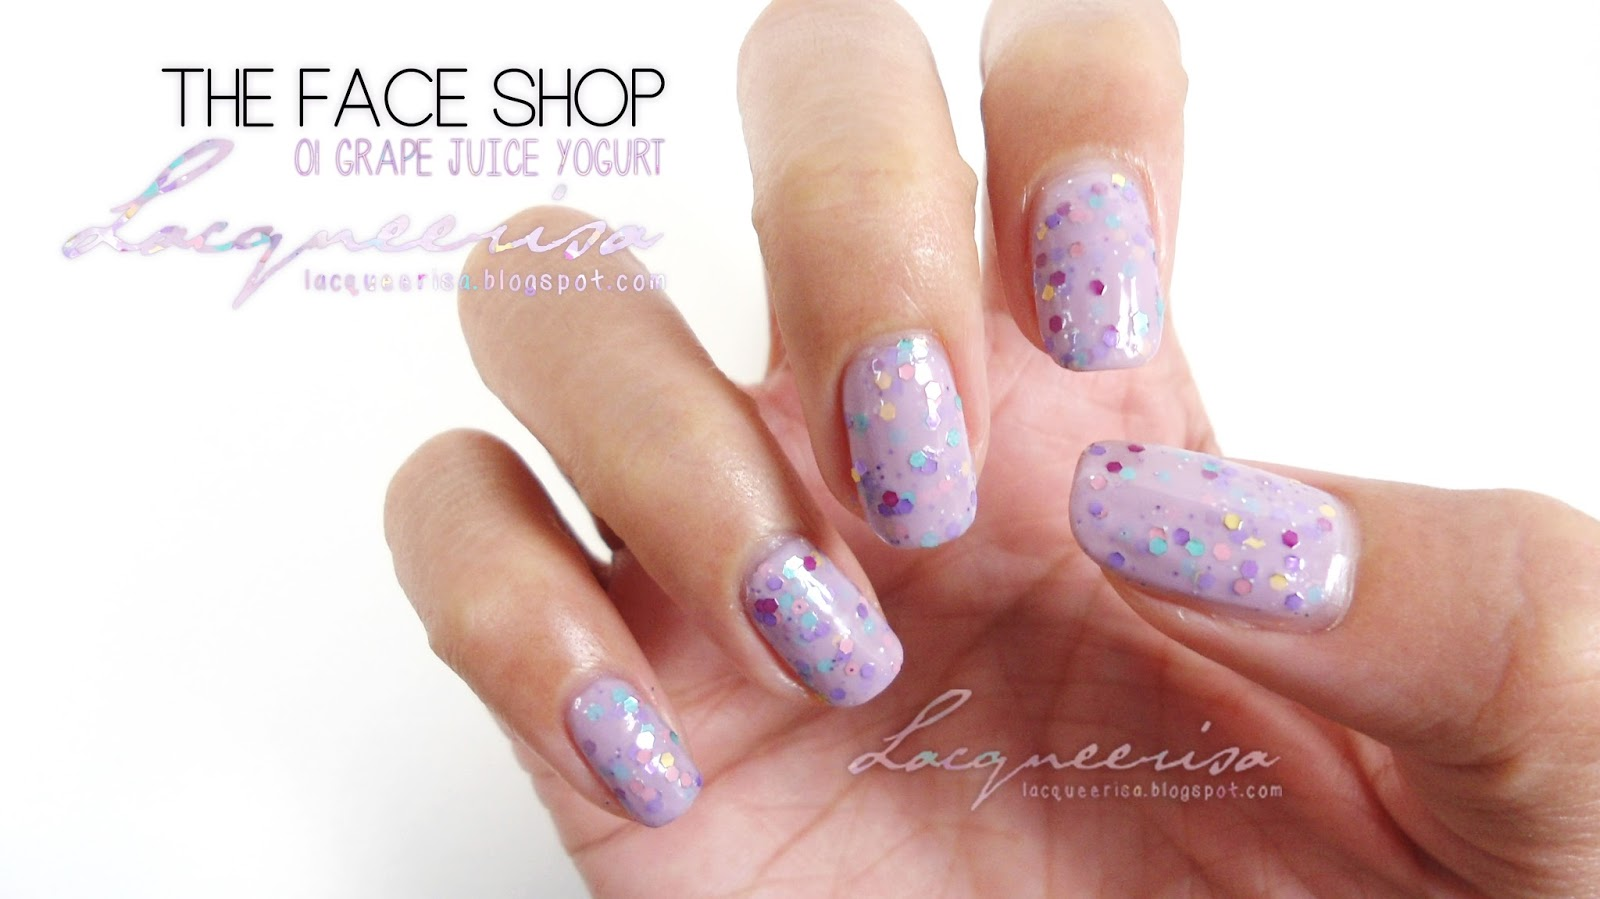 Lacqueerisa: The Face Shop Grape Juice Yogurt